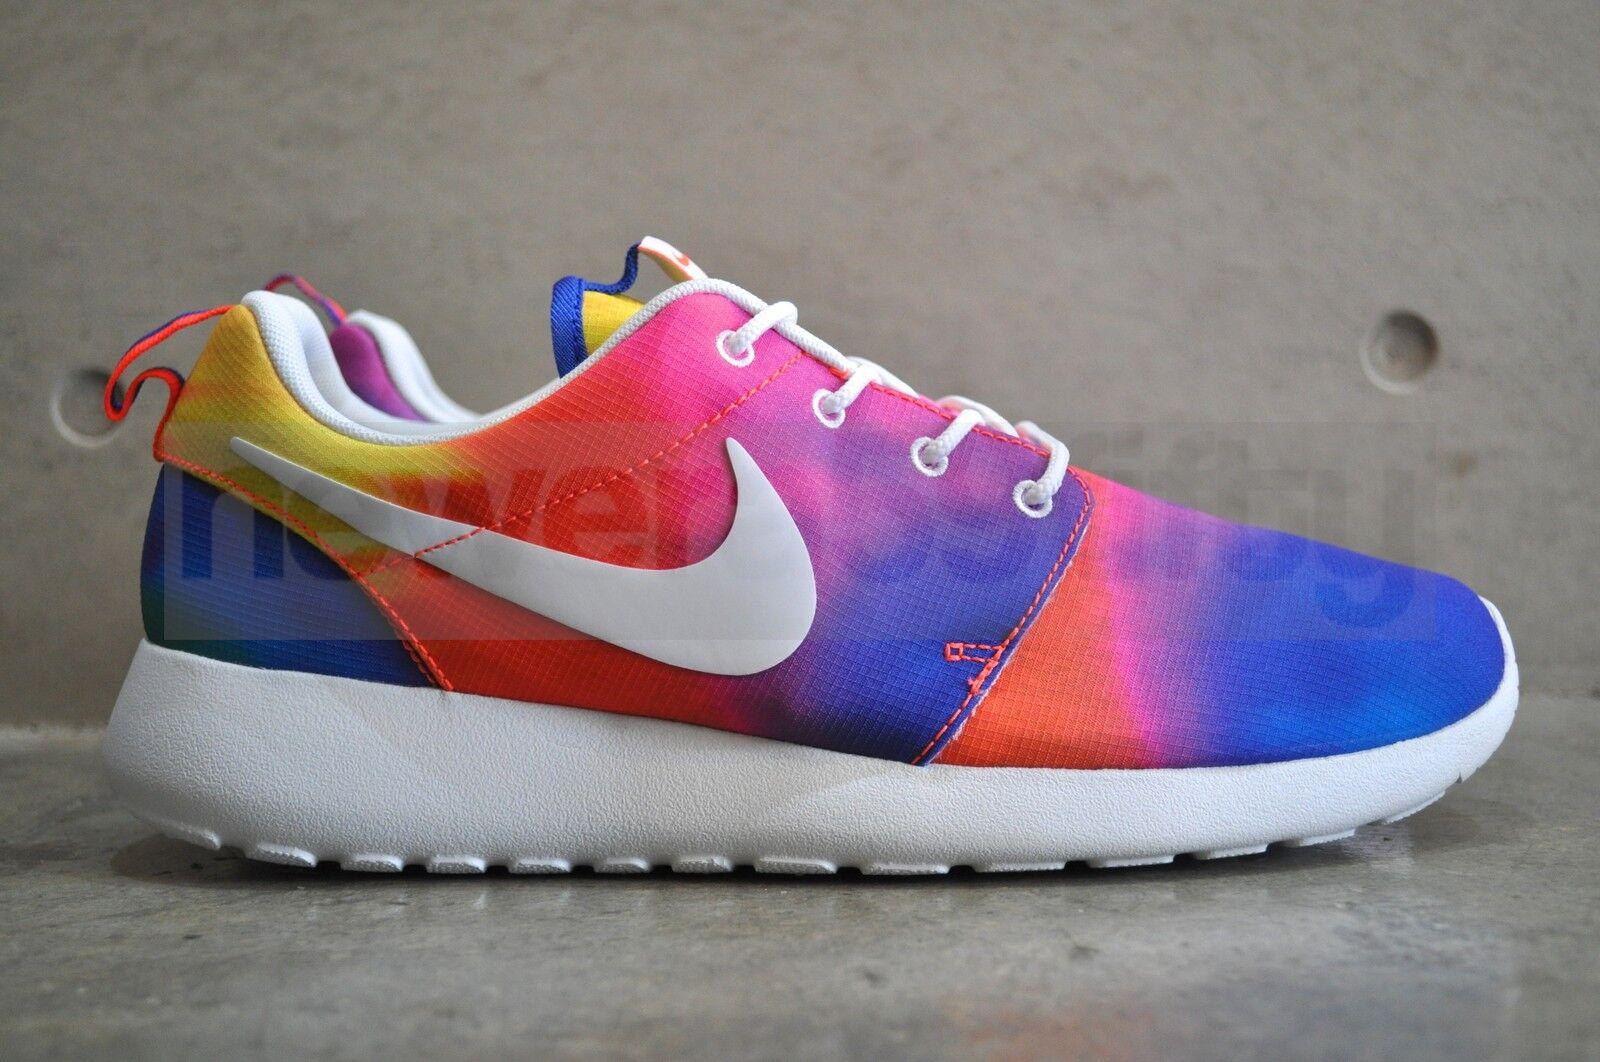 Nike Roshe run - Court Purple/White-Ttl Crimson